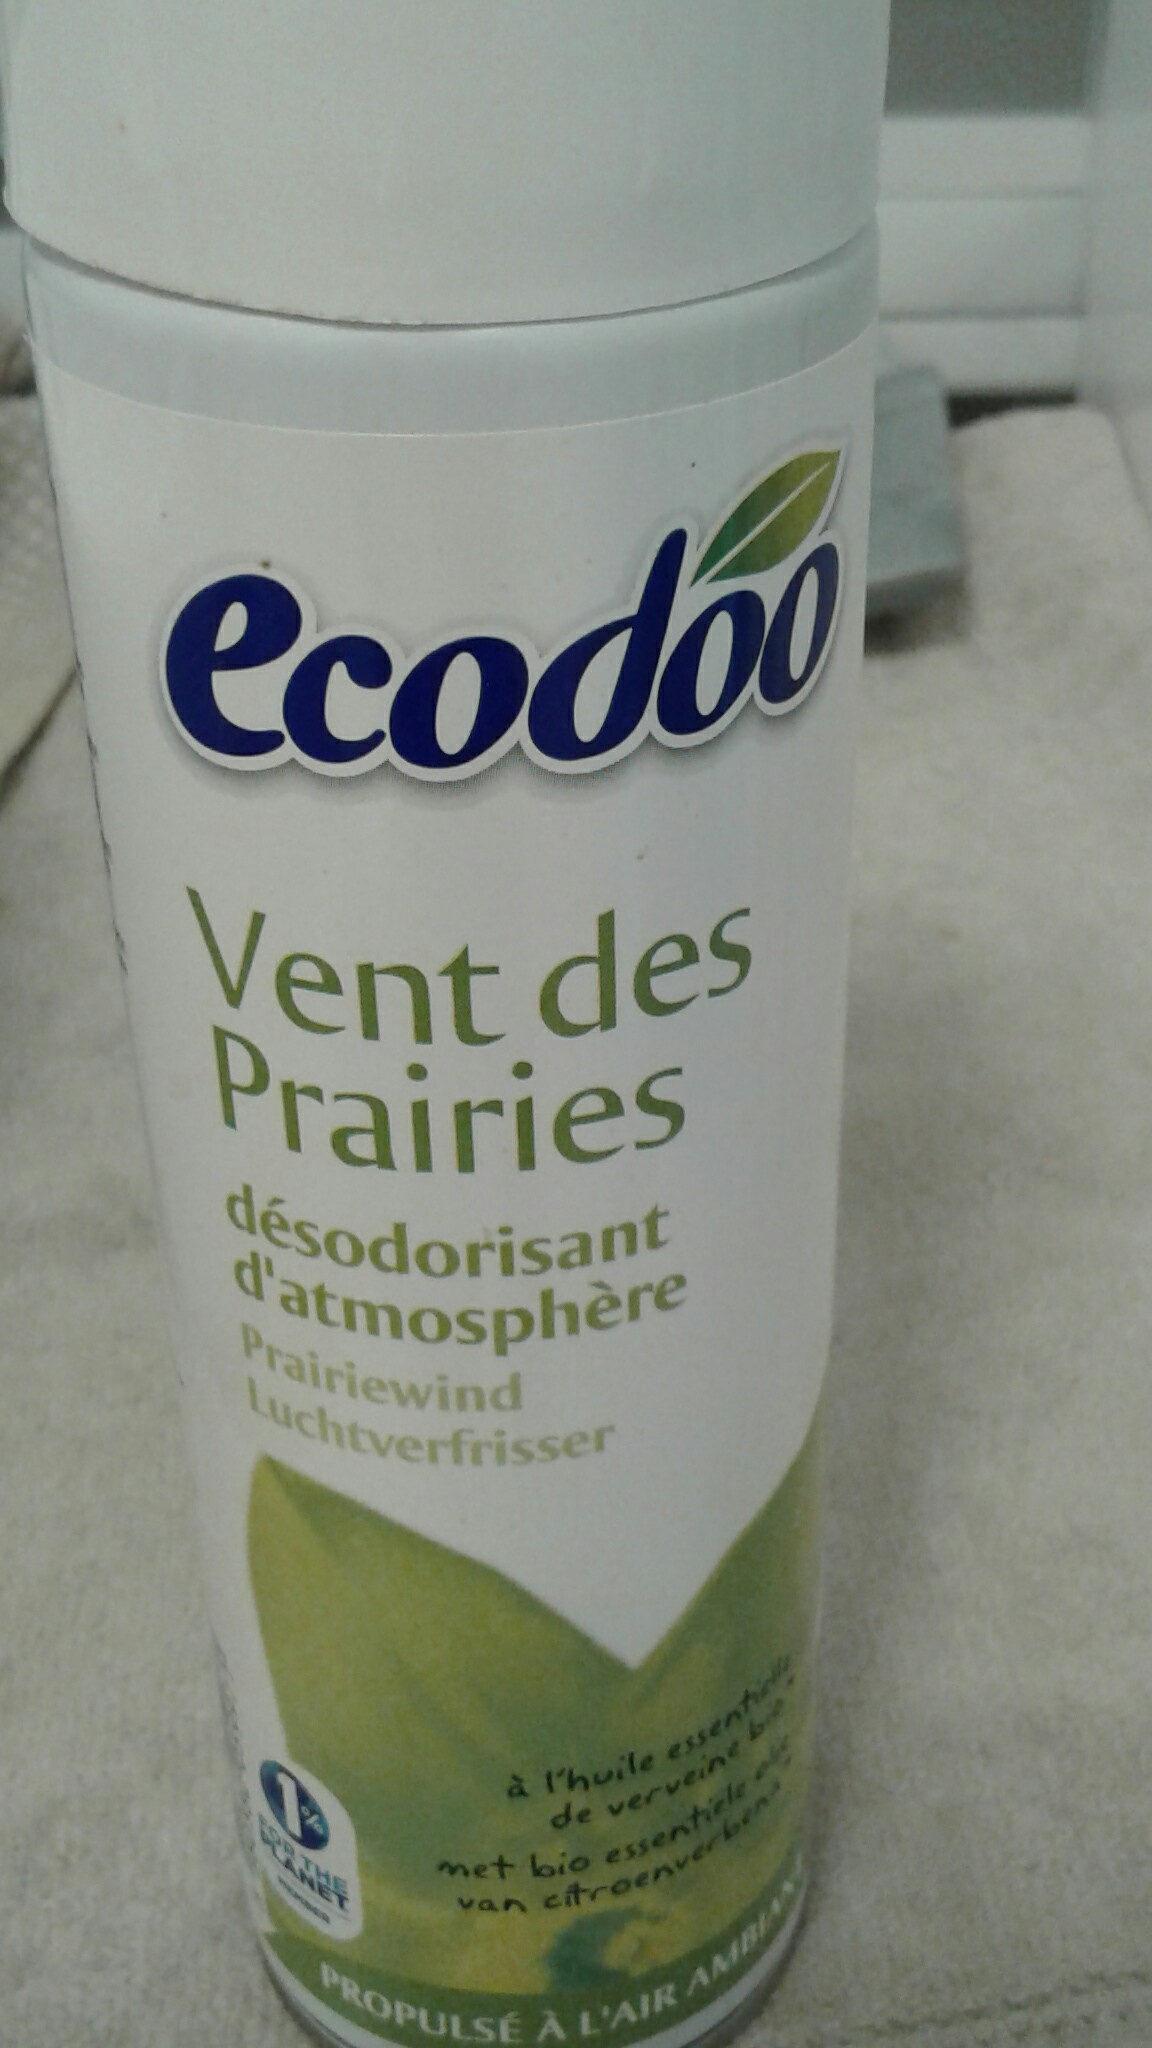 ecodoo - Product - fr